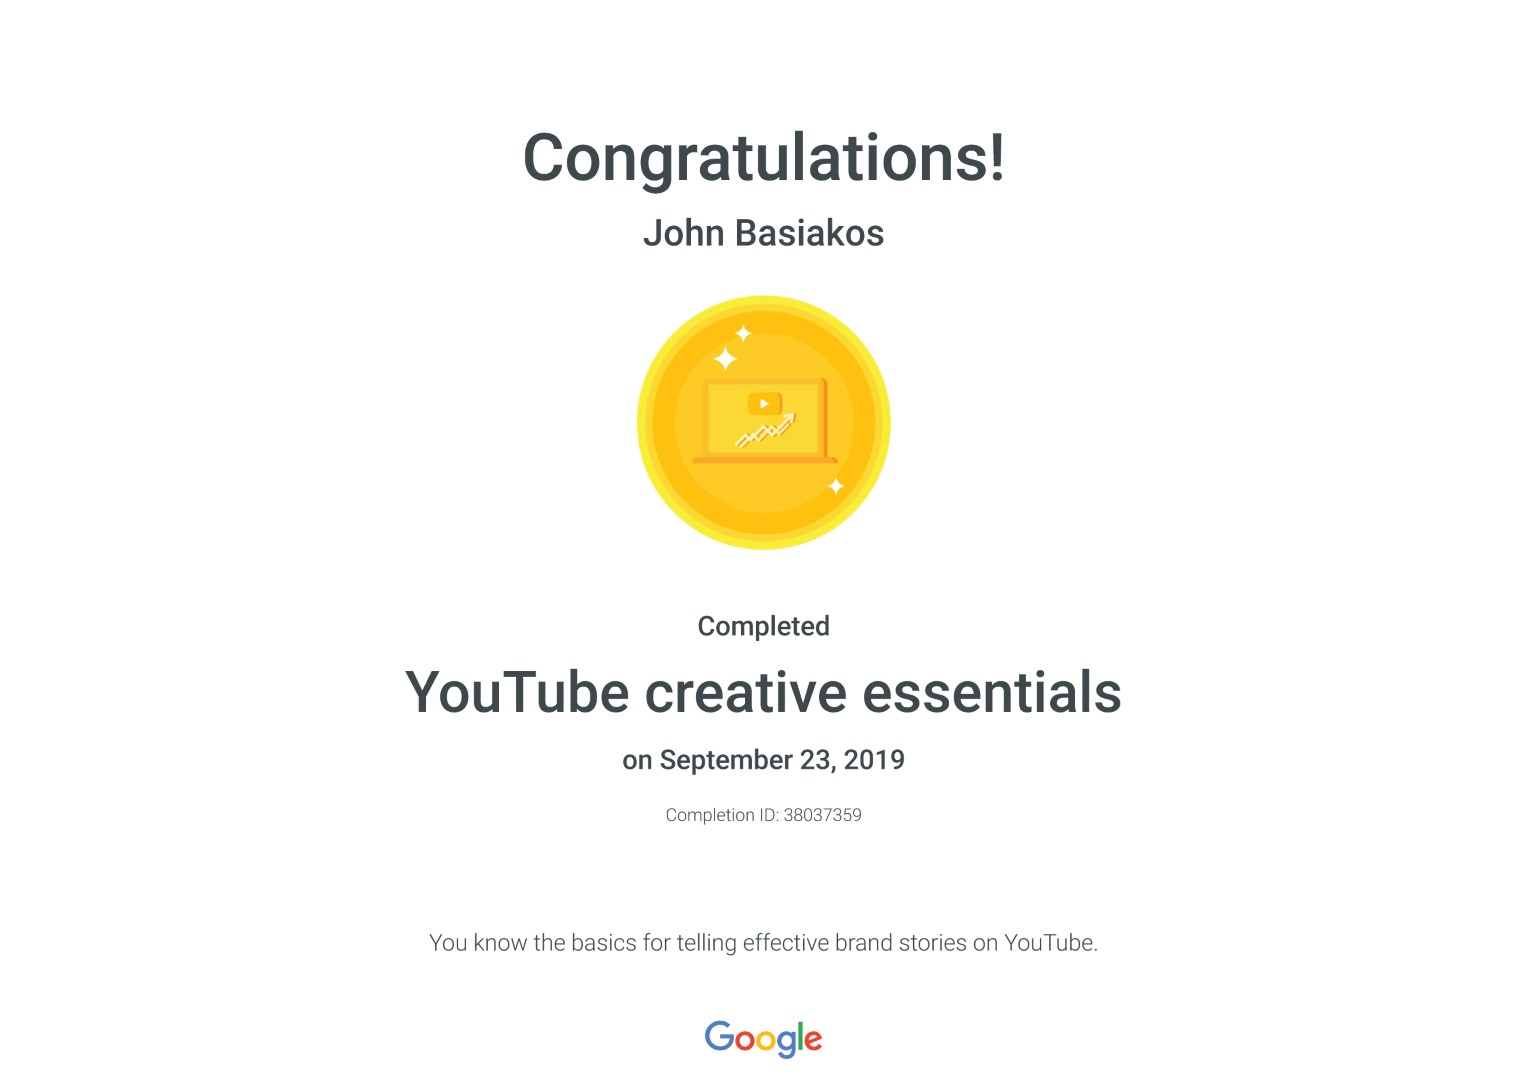 YouTube creative essentials _ Google